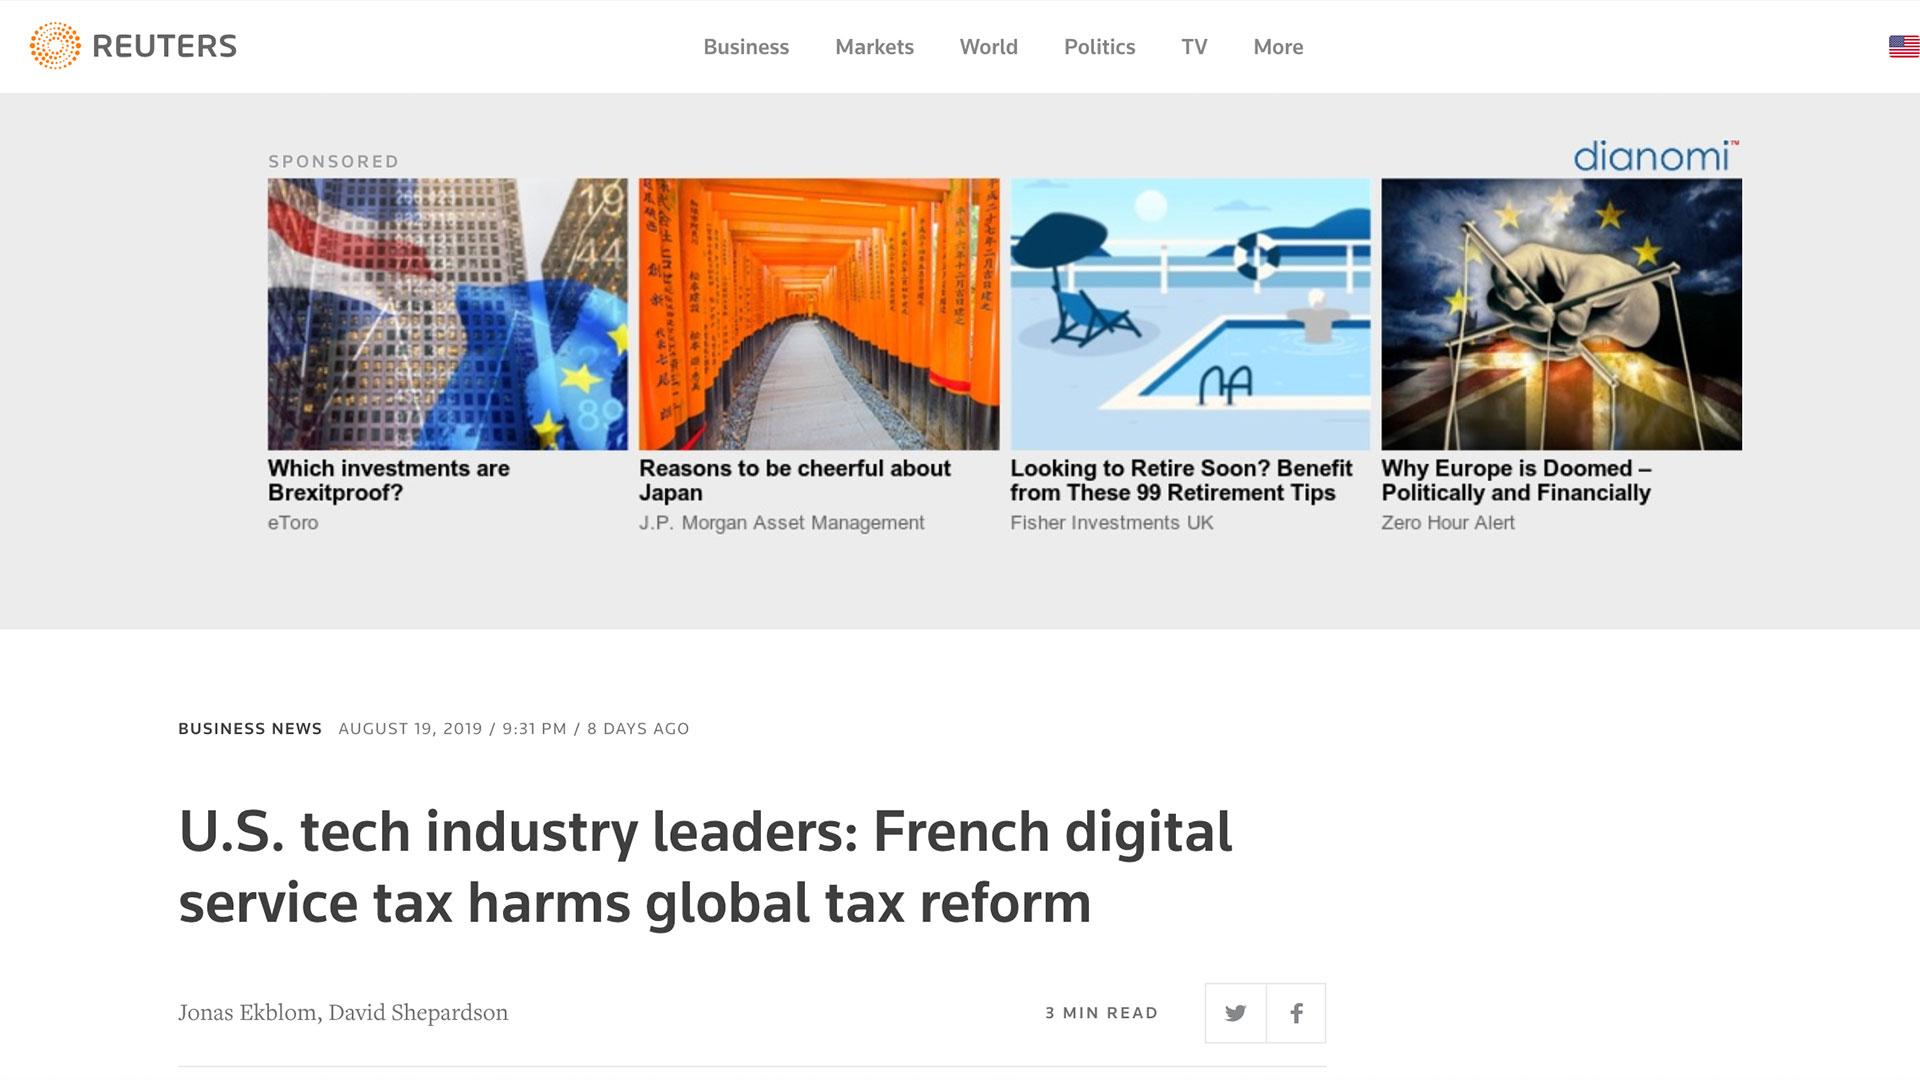 Fairness Rocks News U.S. tech industry leaders: French digital service tax harms global tax reform